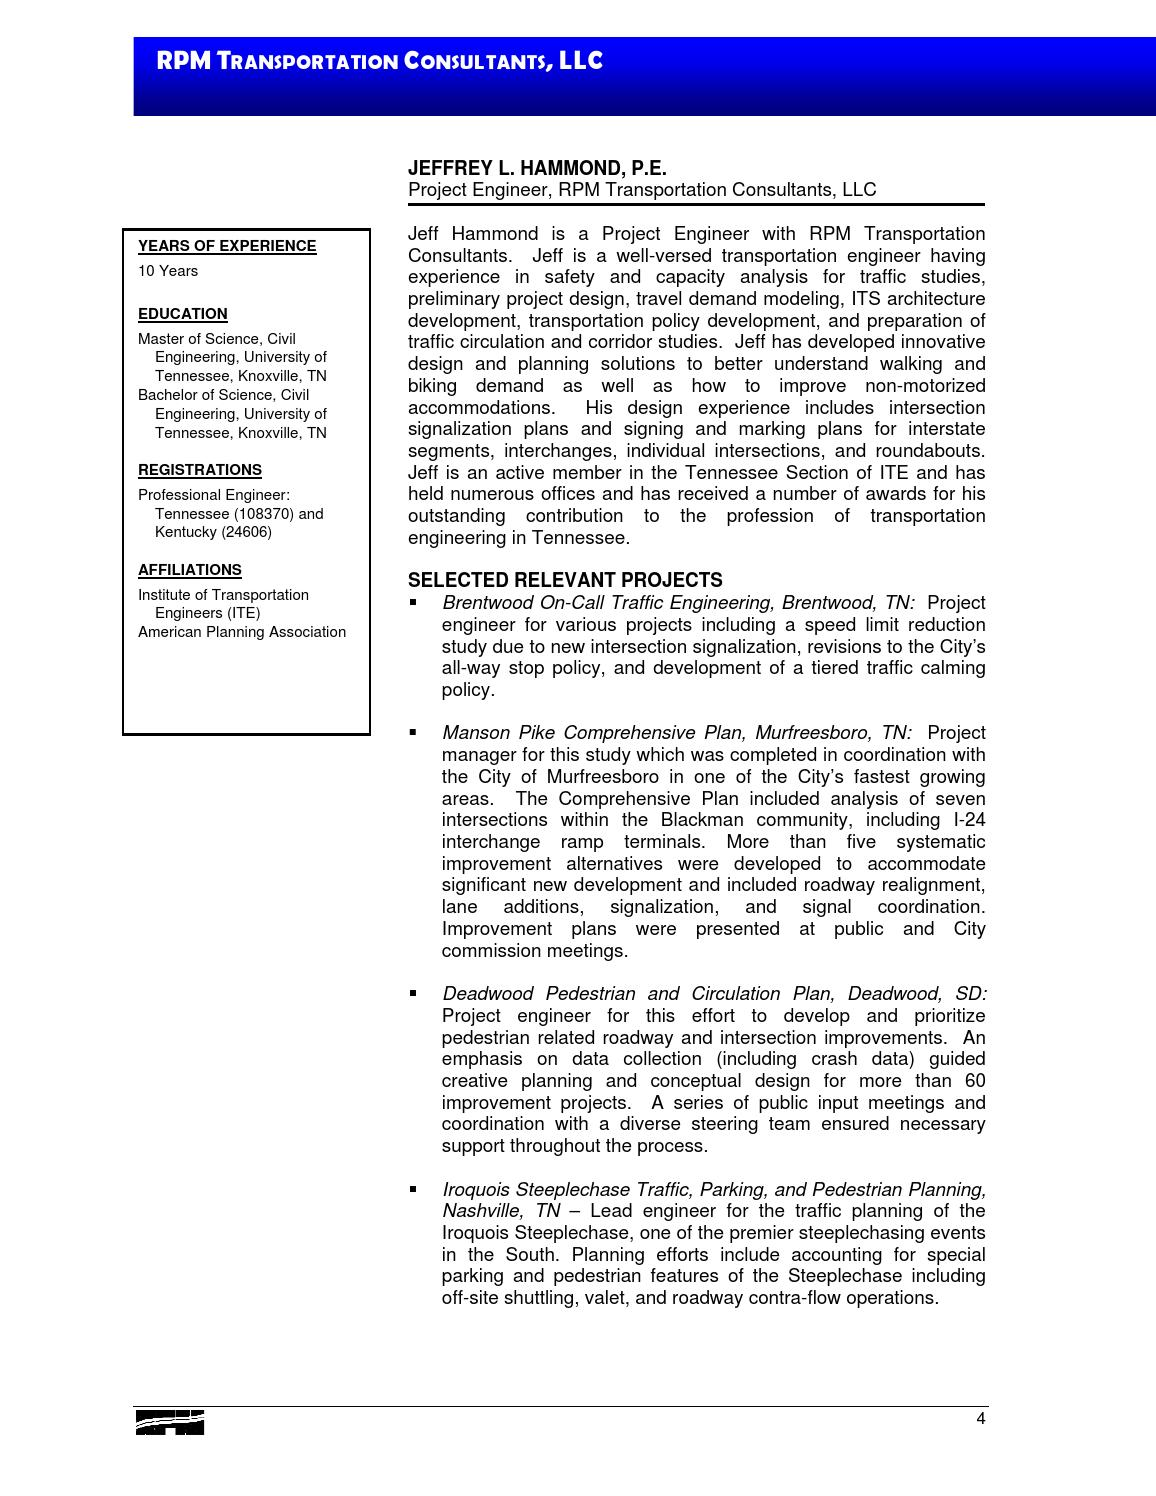 LA8302 futurePRACTICE_NRF Proposal by Matthew Tucker - issuu